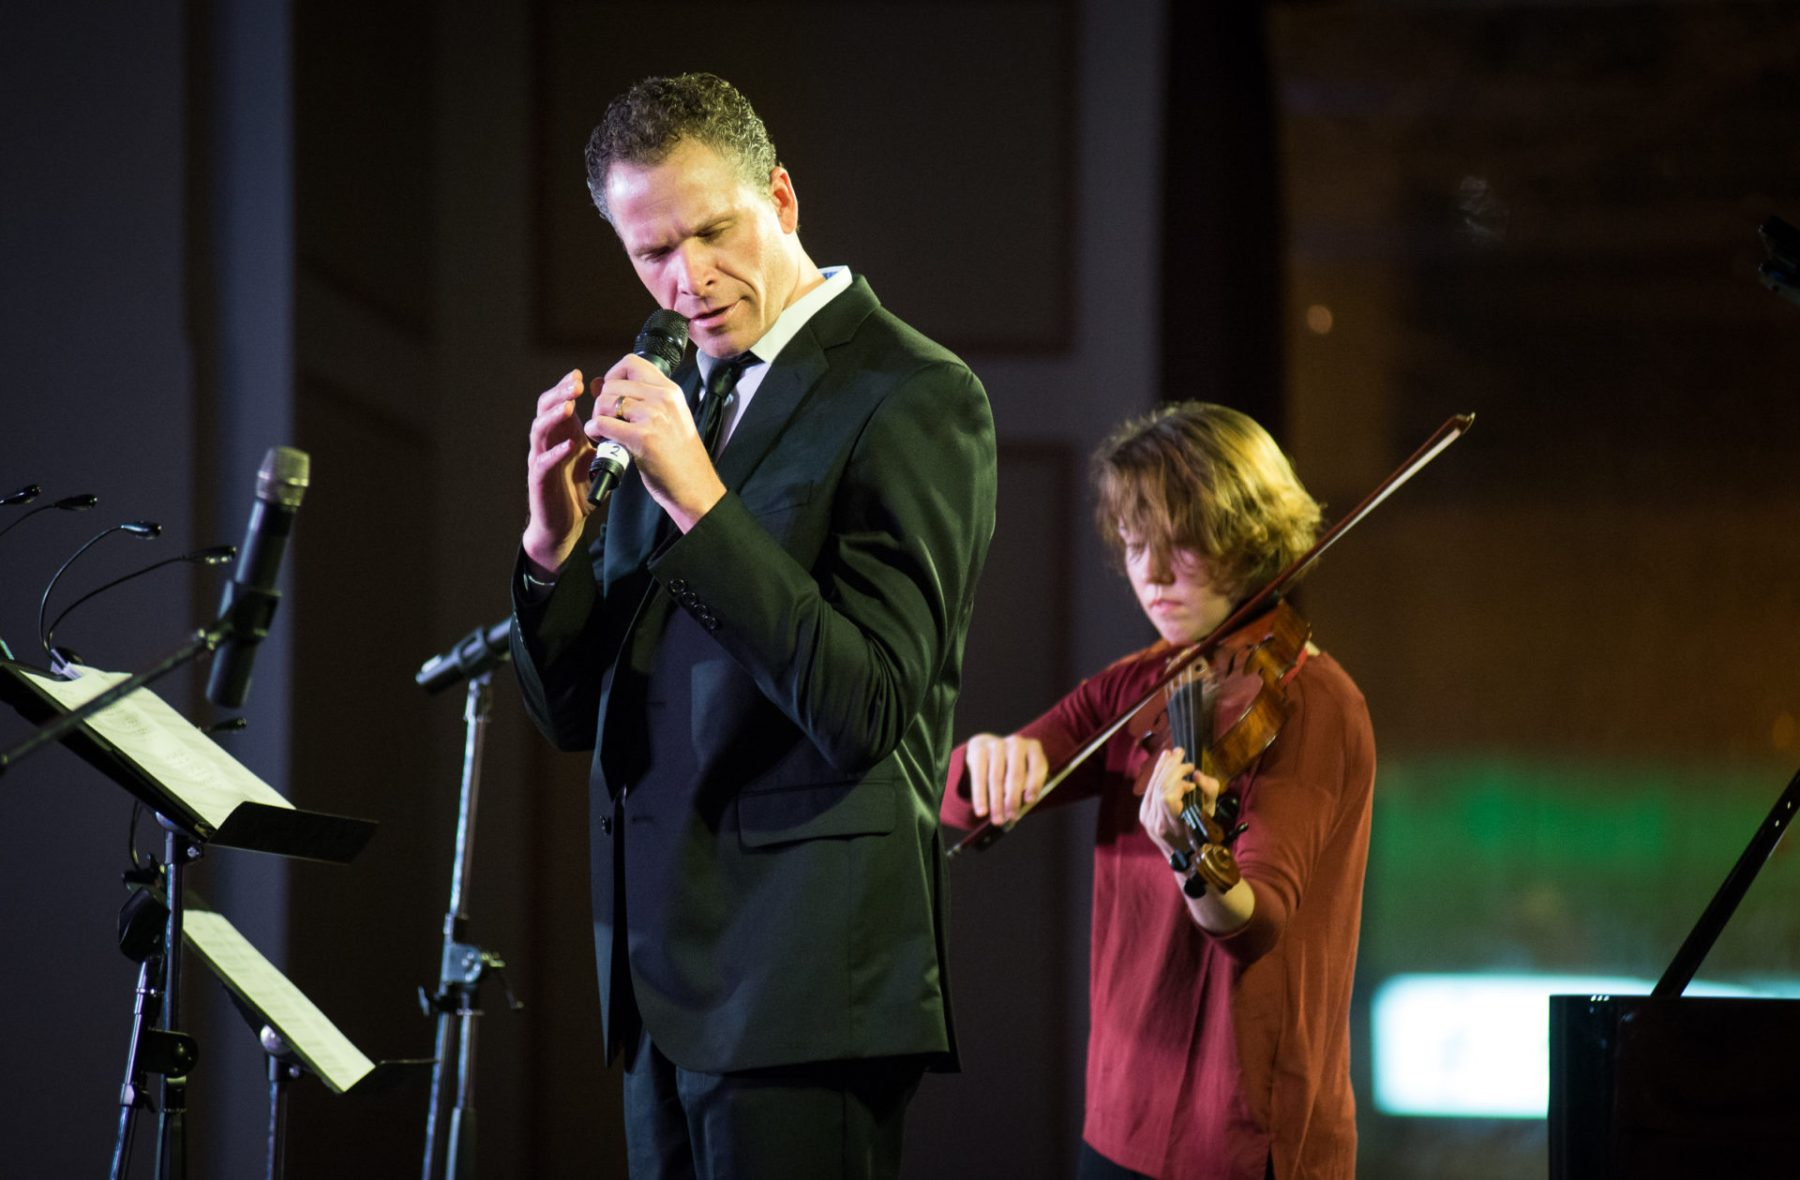 Steve Maddock & Caroline Shaw, Music for the Winter Solstice 2015